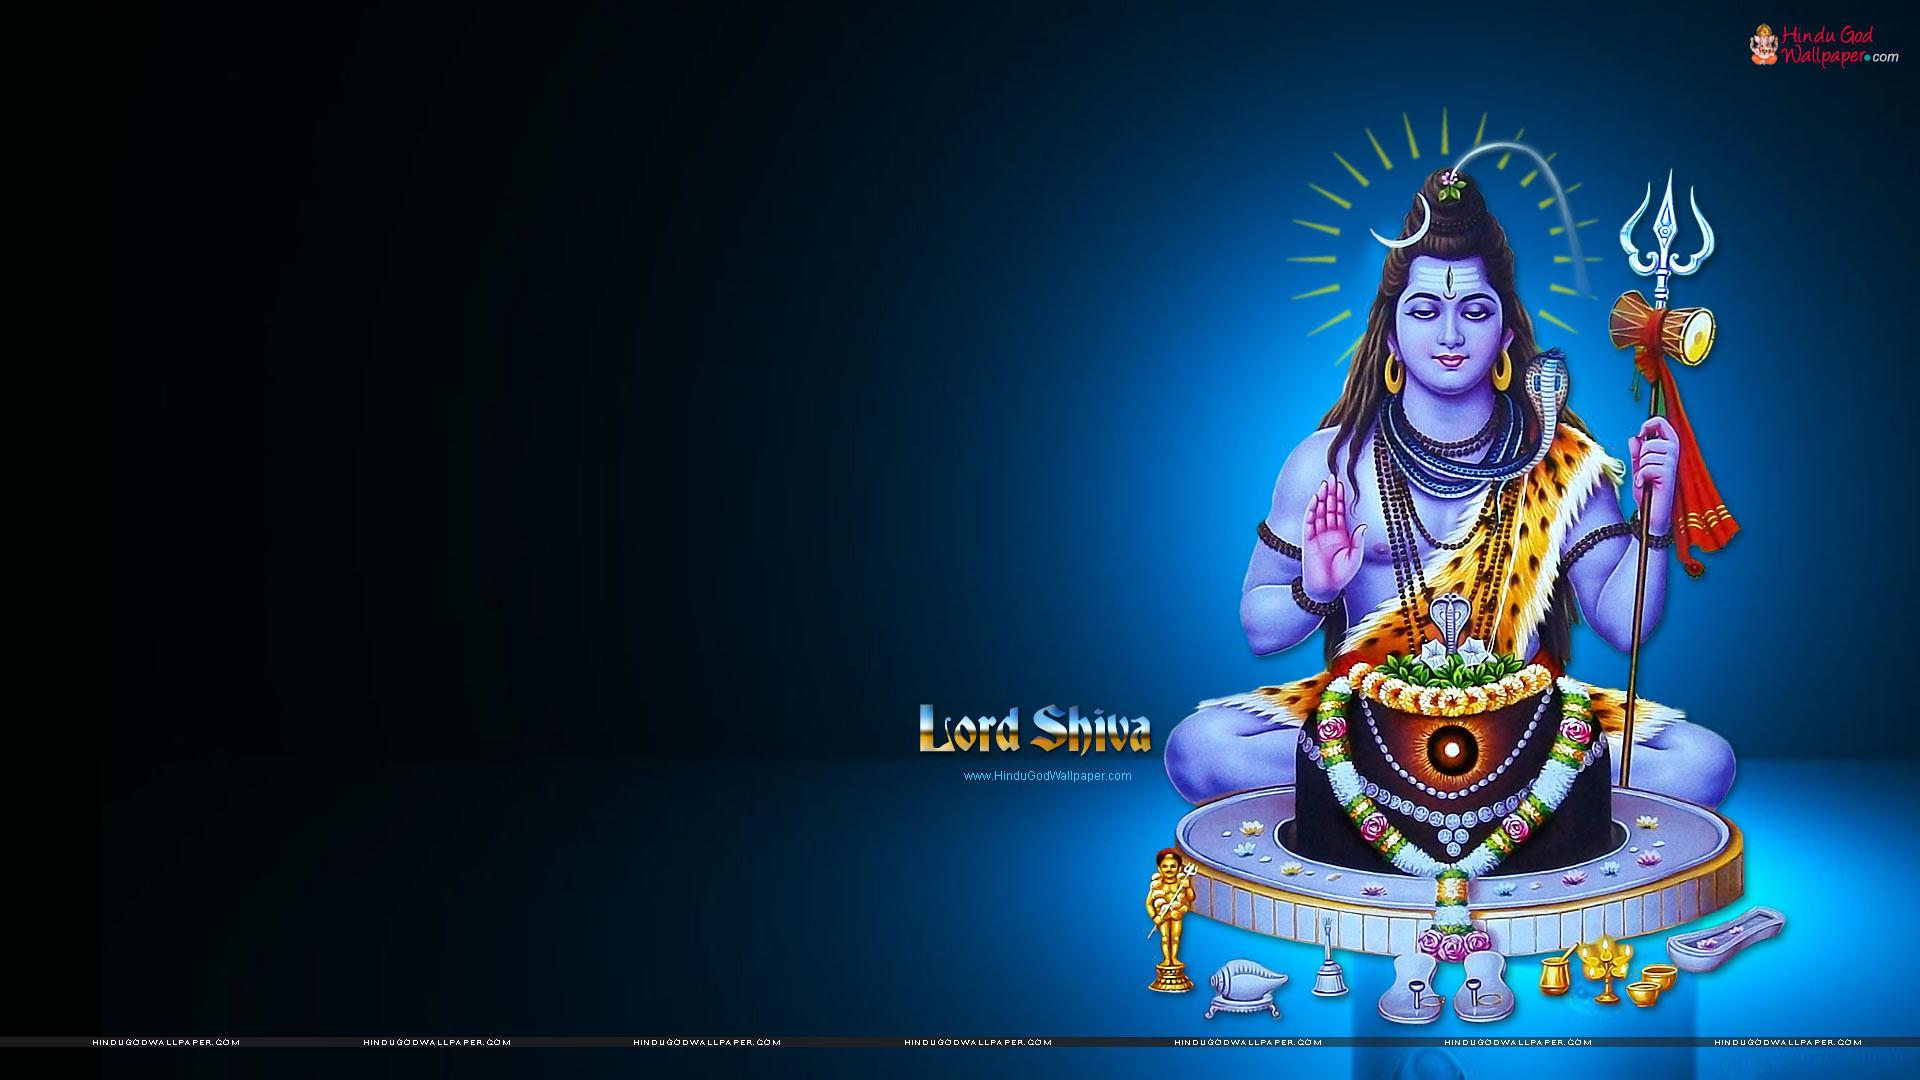 Lord Shiva Hd Wallpapers 1920x1080 Download Apfiwingsu West Virginia